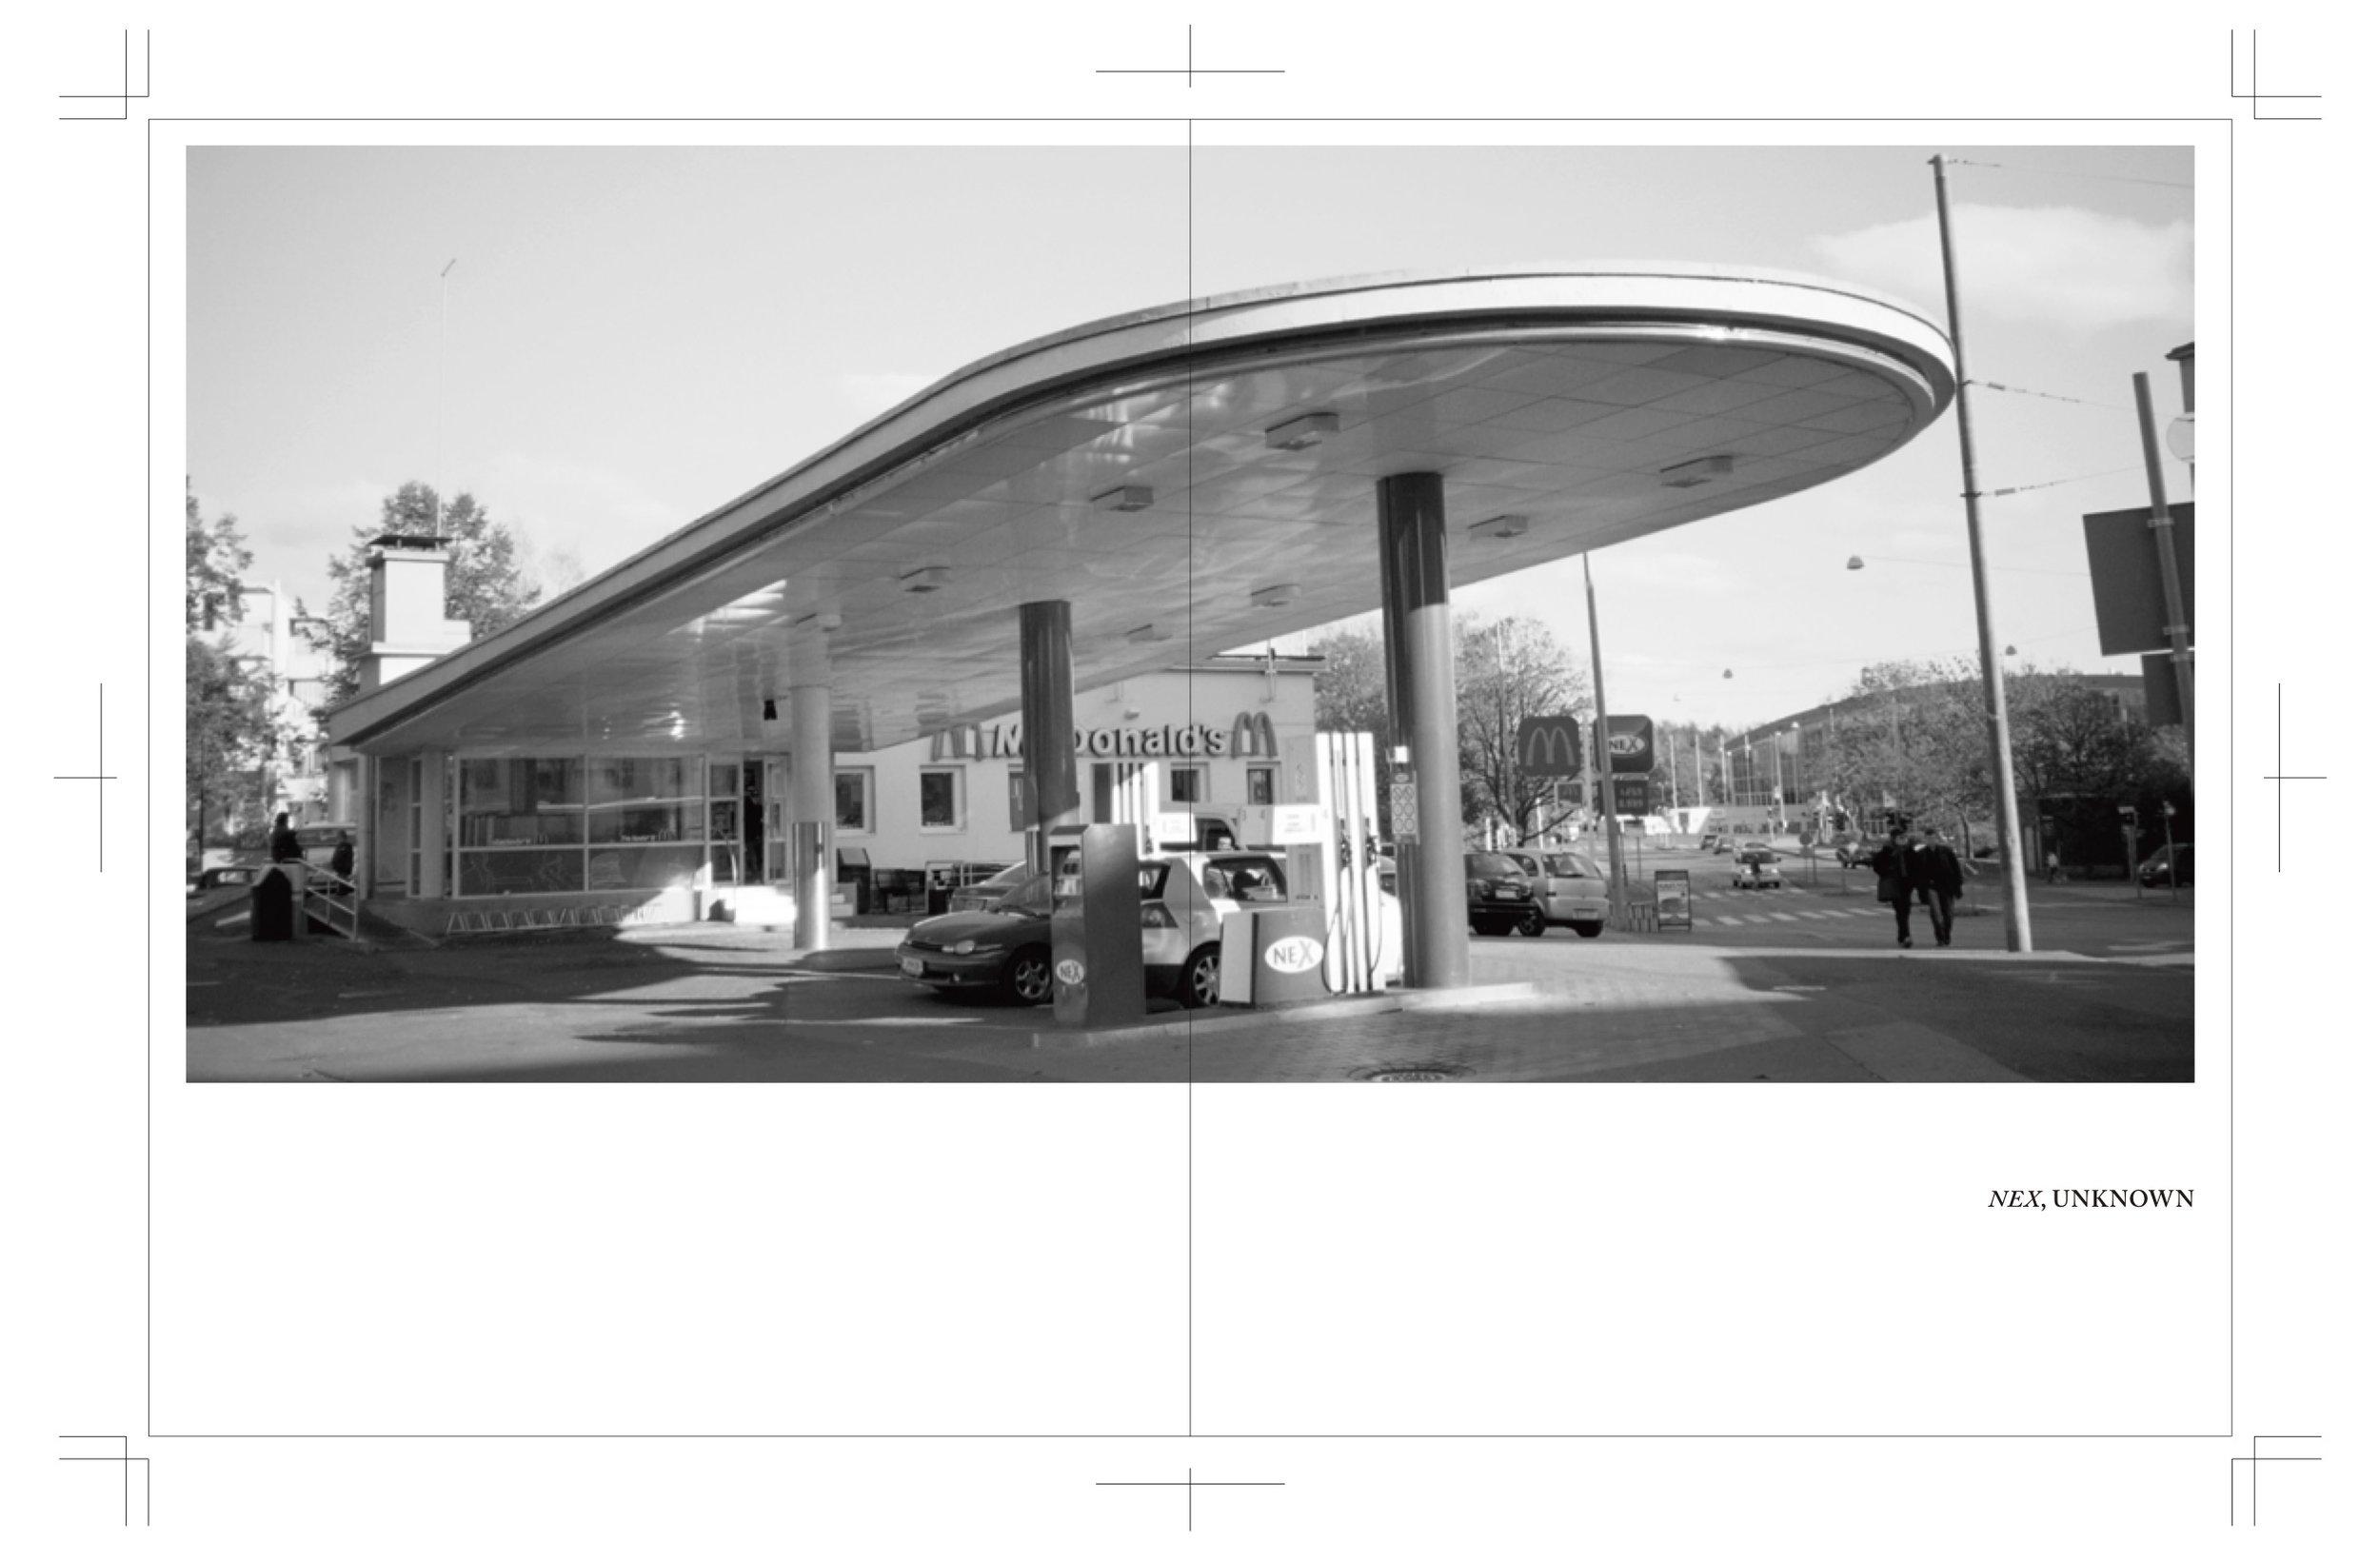 gasoline_01 23.jpeg